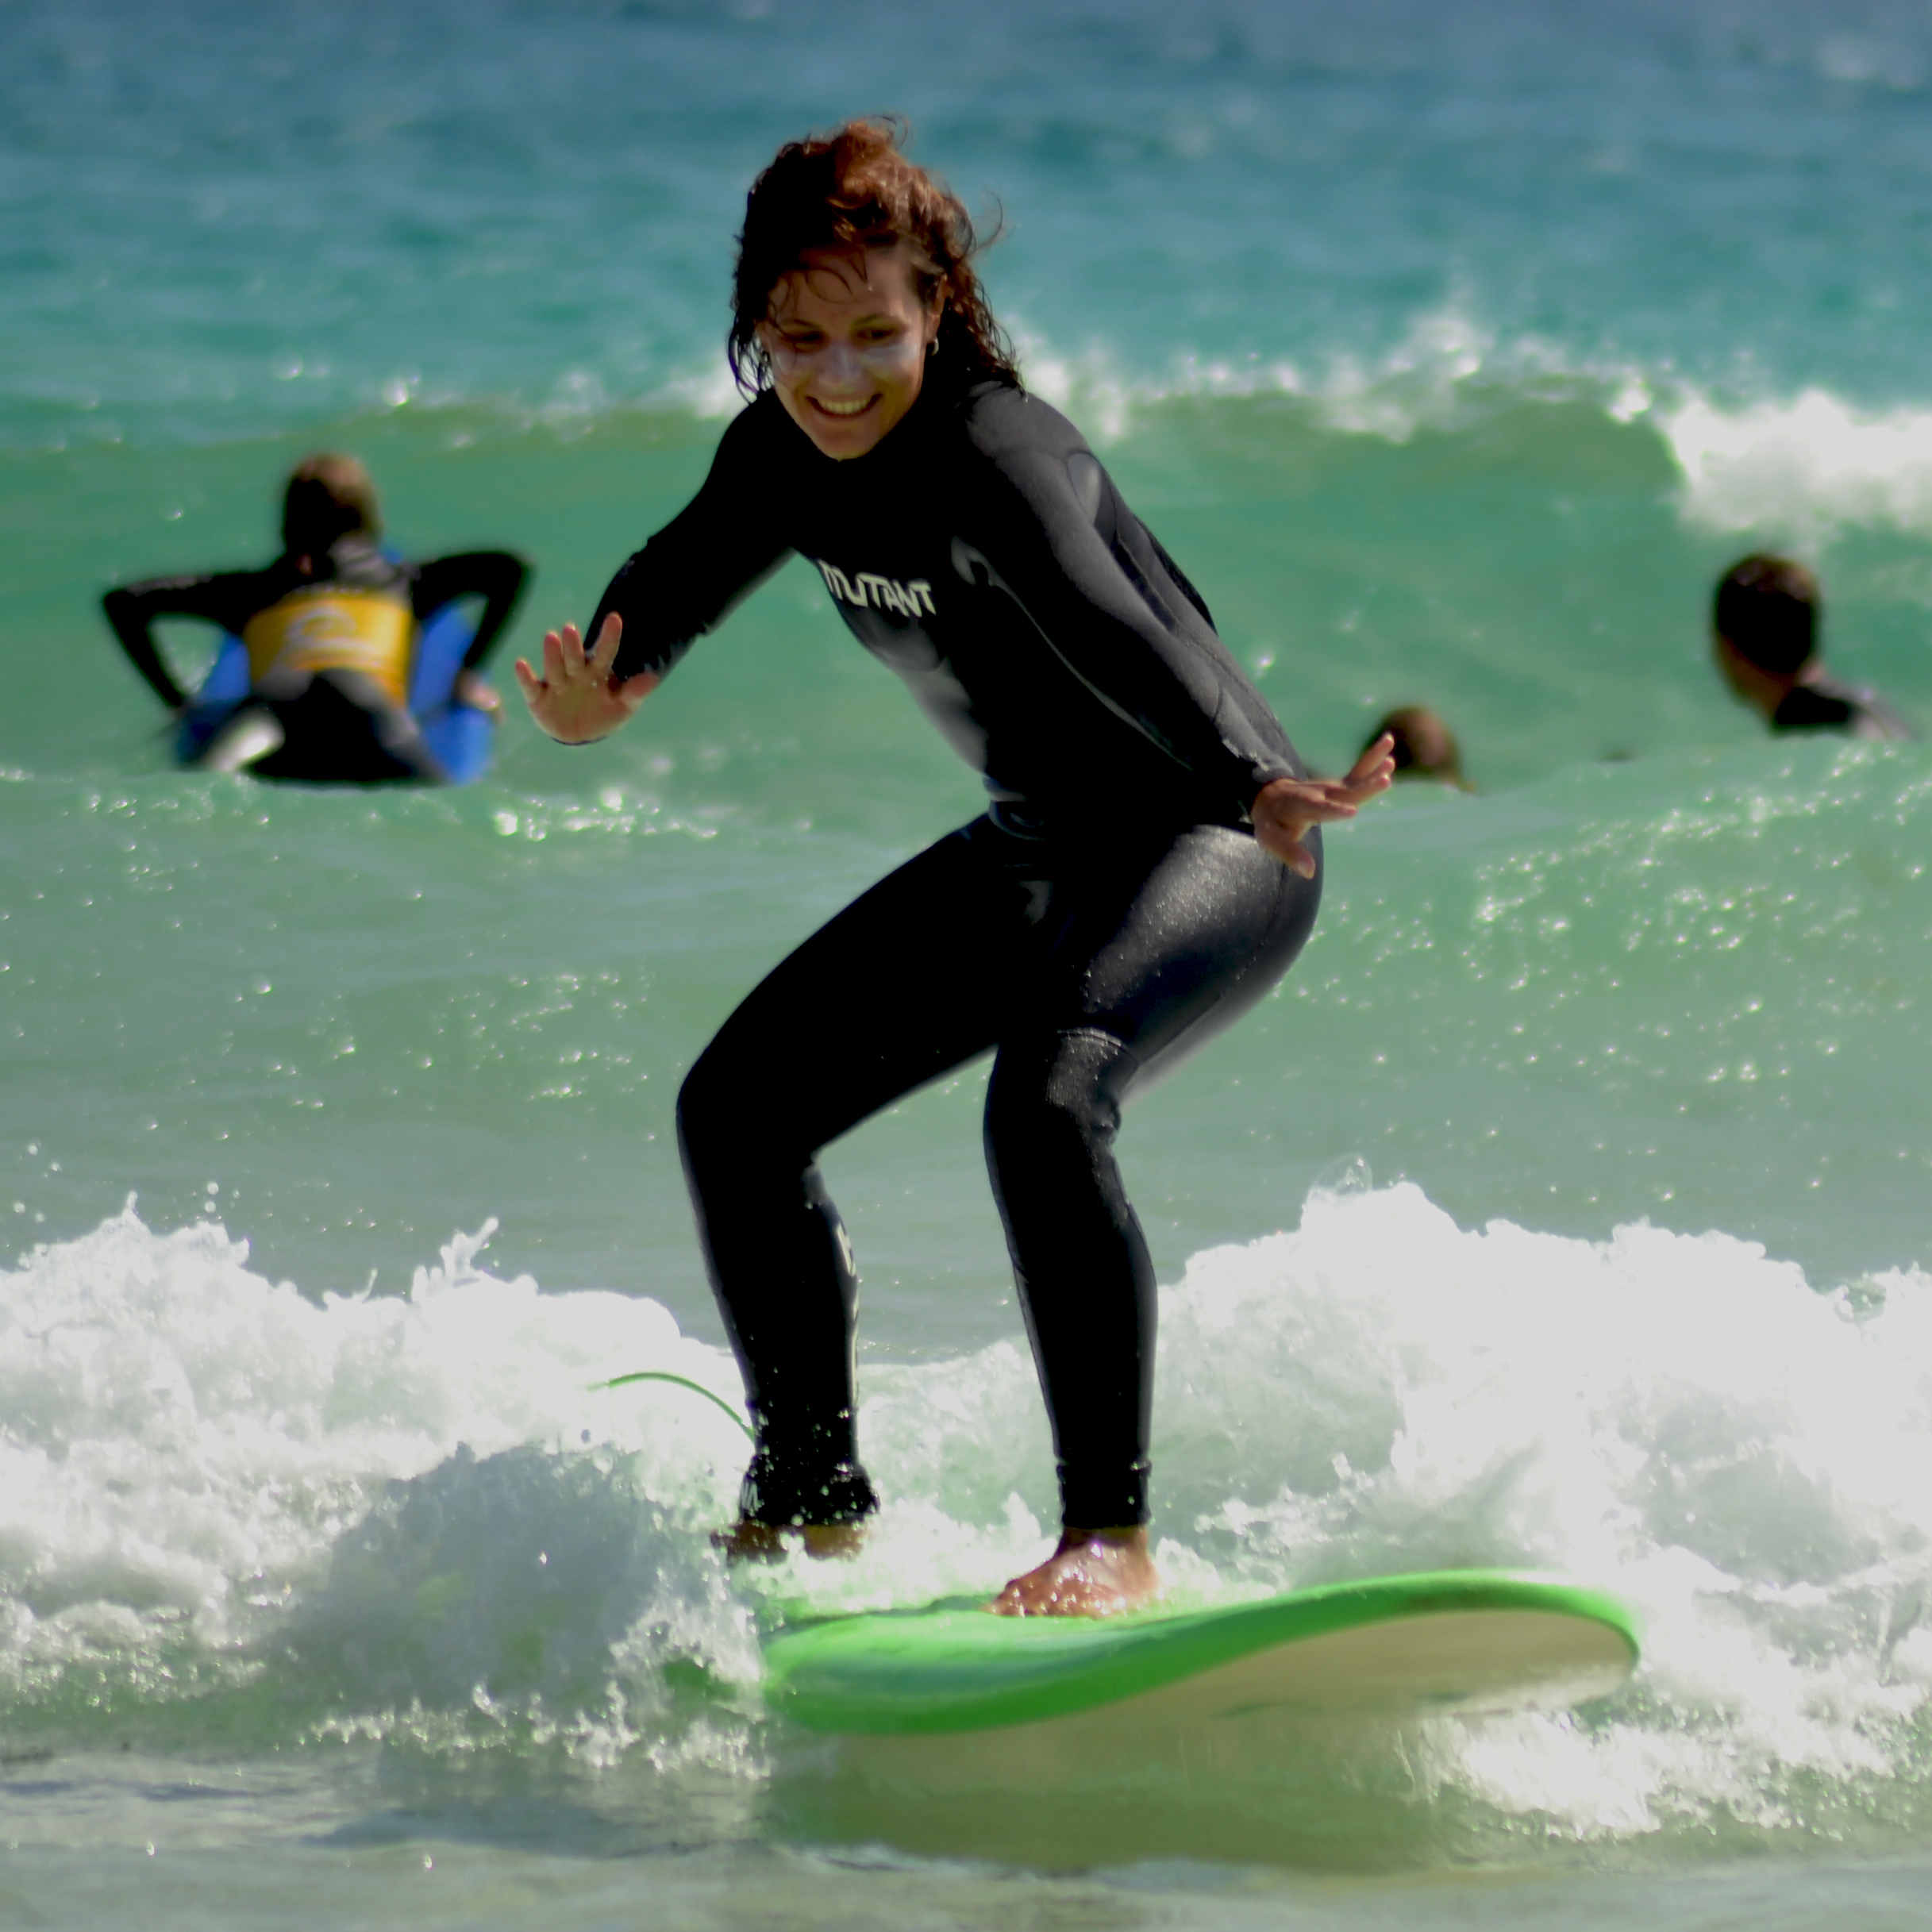 surf-course-fuerteventura.JPG